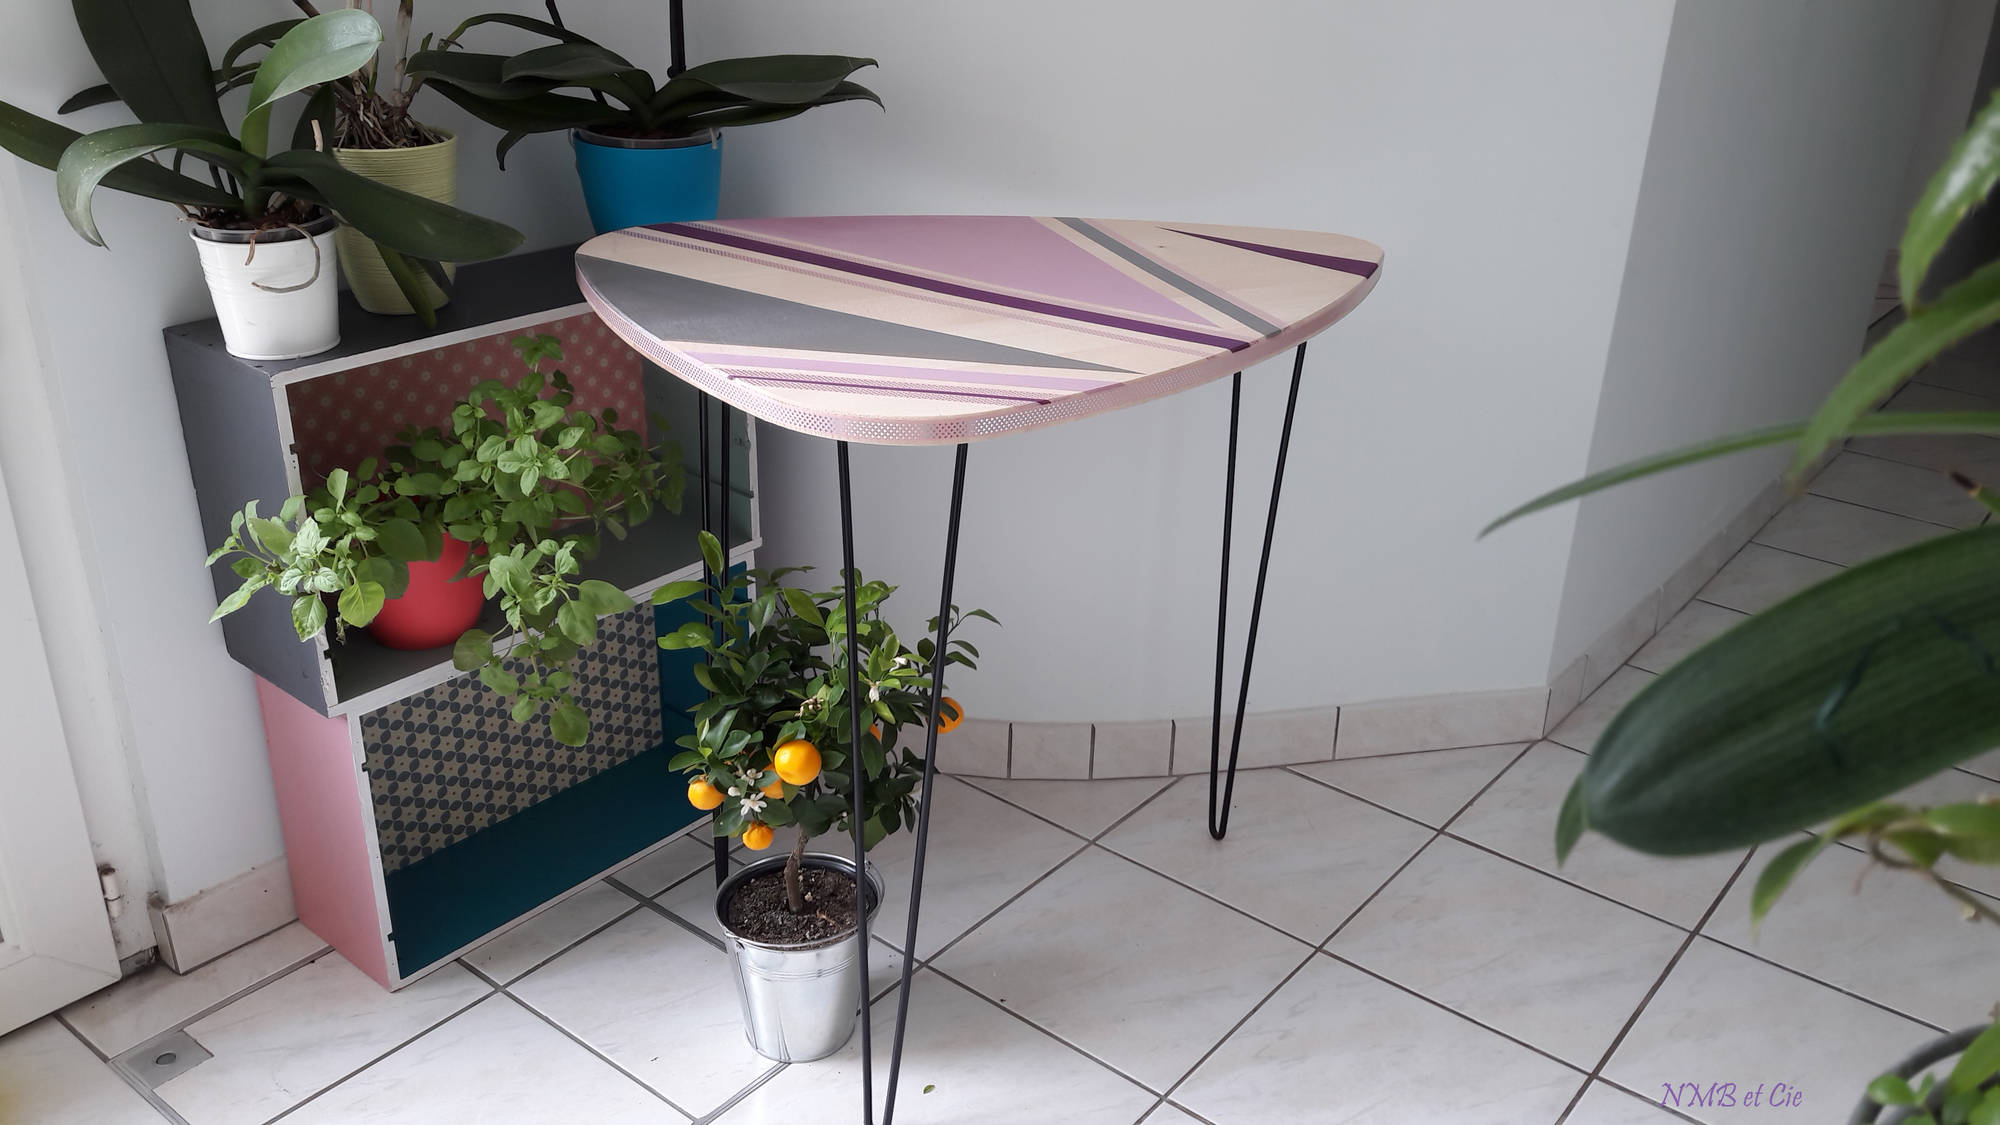 L 39 atelier meuble zefabrik blog z dio - Zodio chambourcy atelier cuisine ...